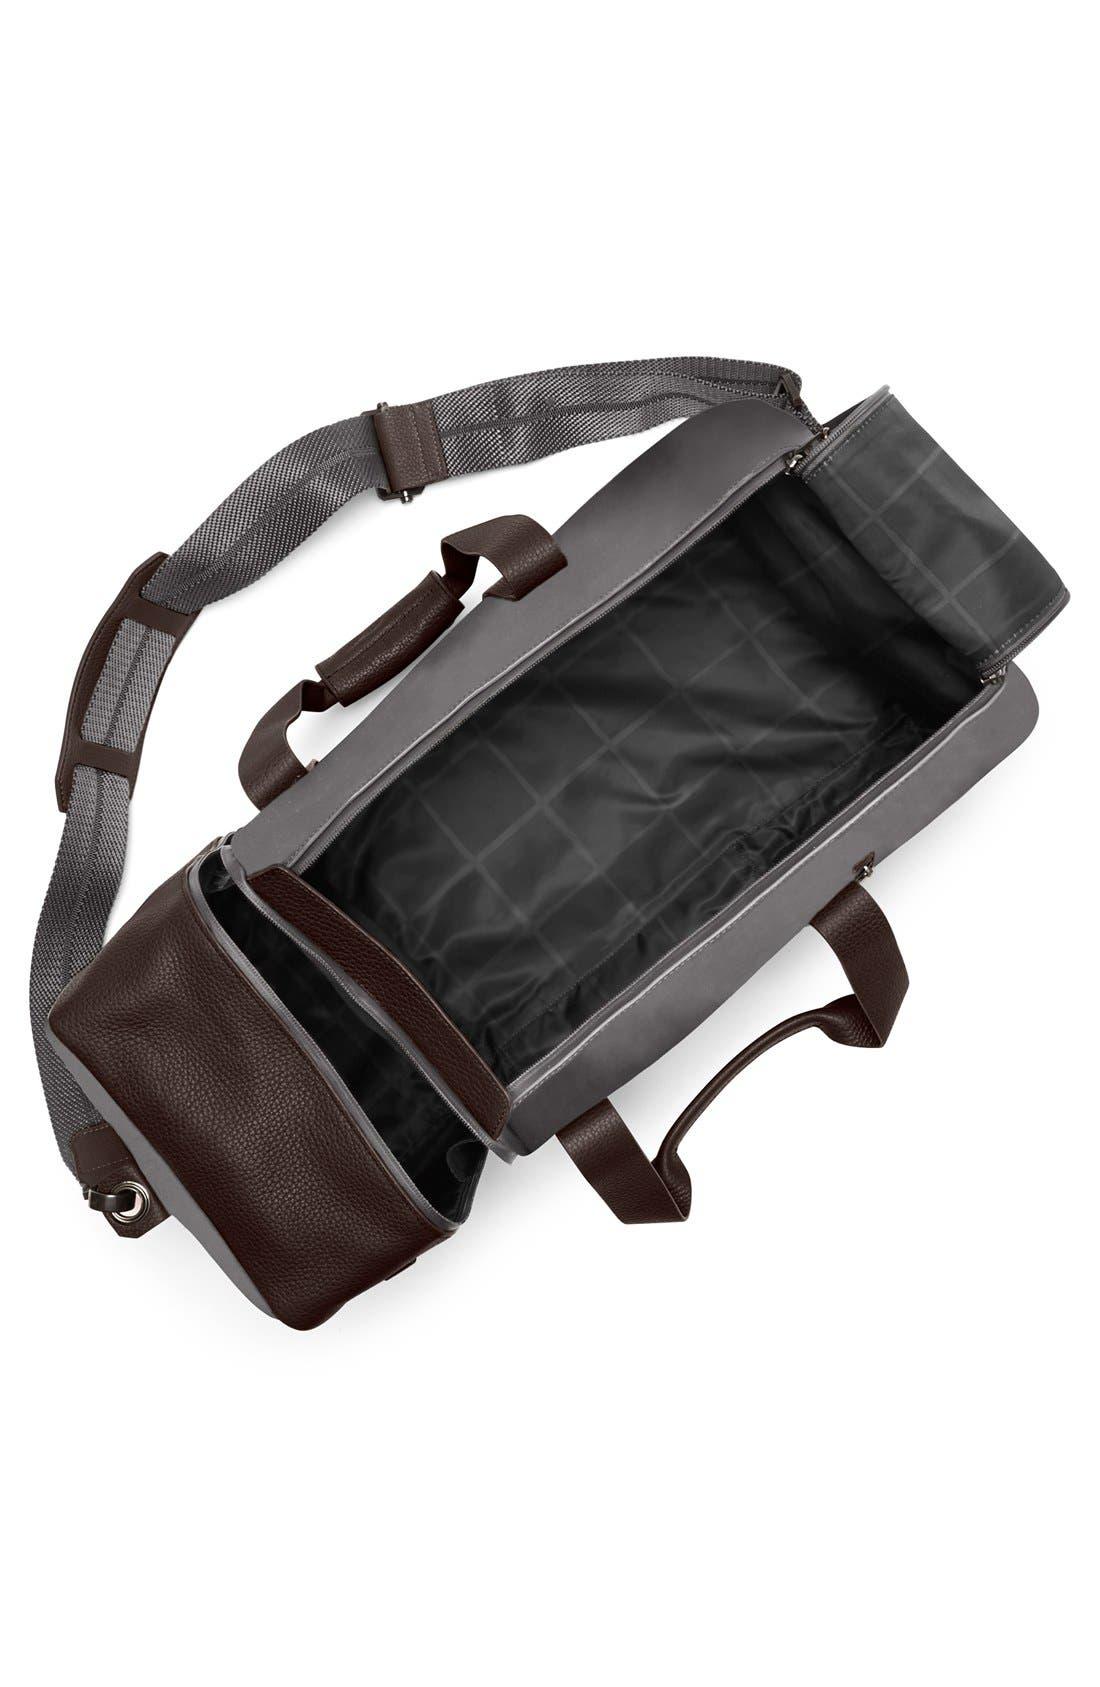 'Mestr' Duffel Bag,                             Alternate thumbnail 3, color,                             021